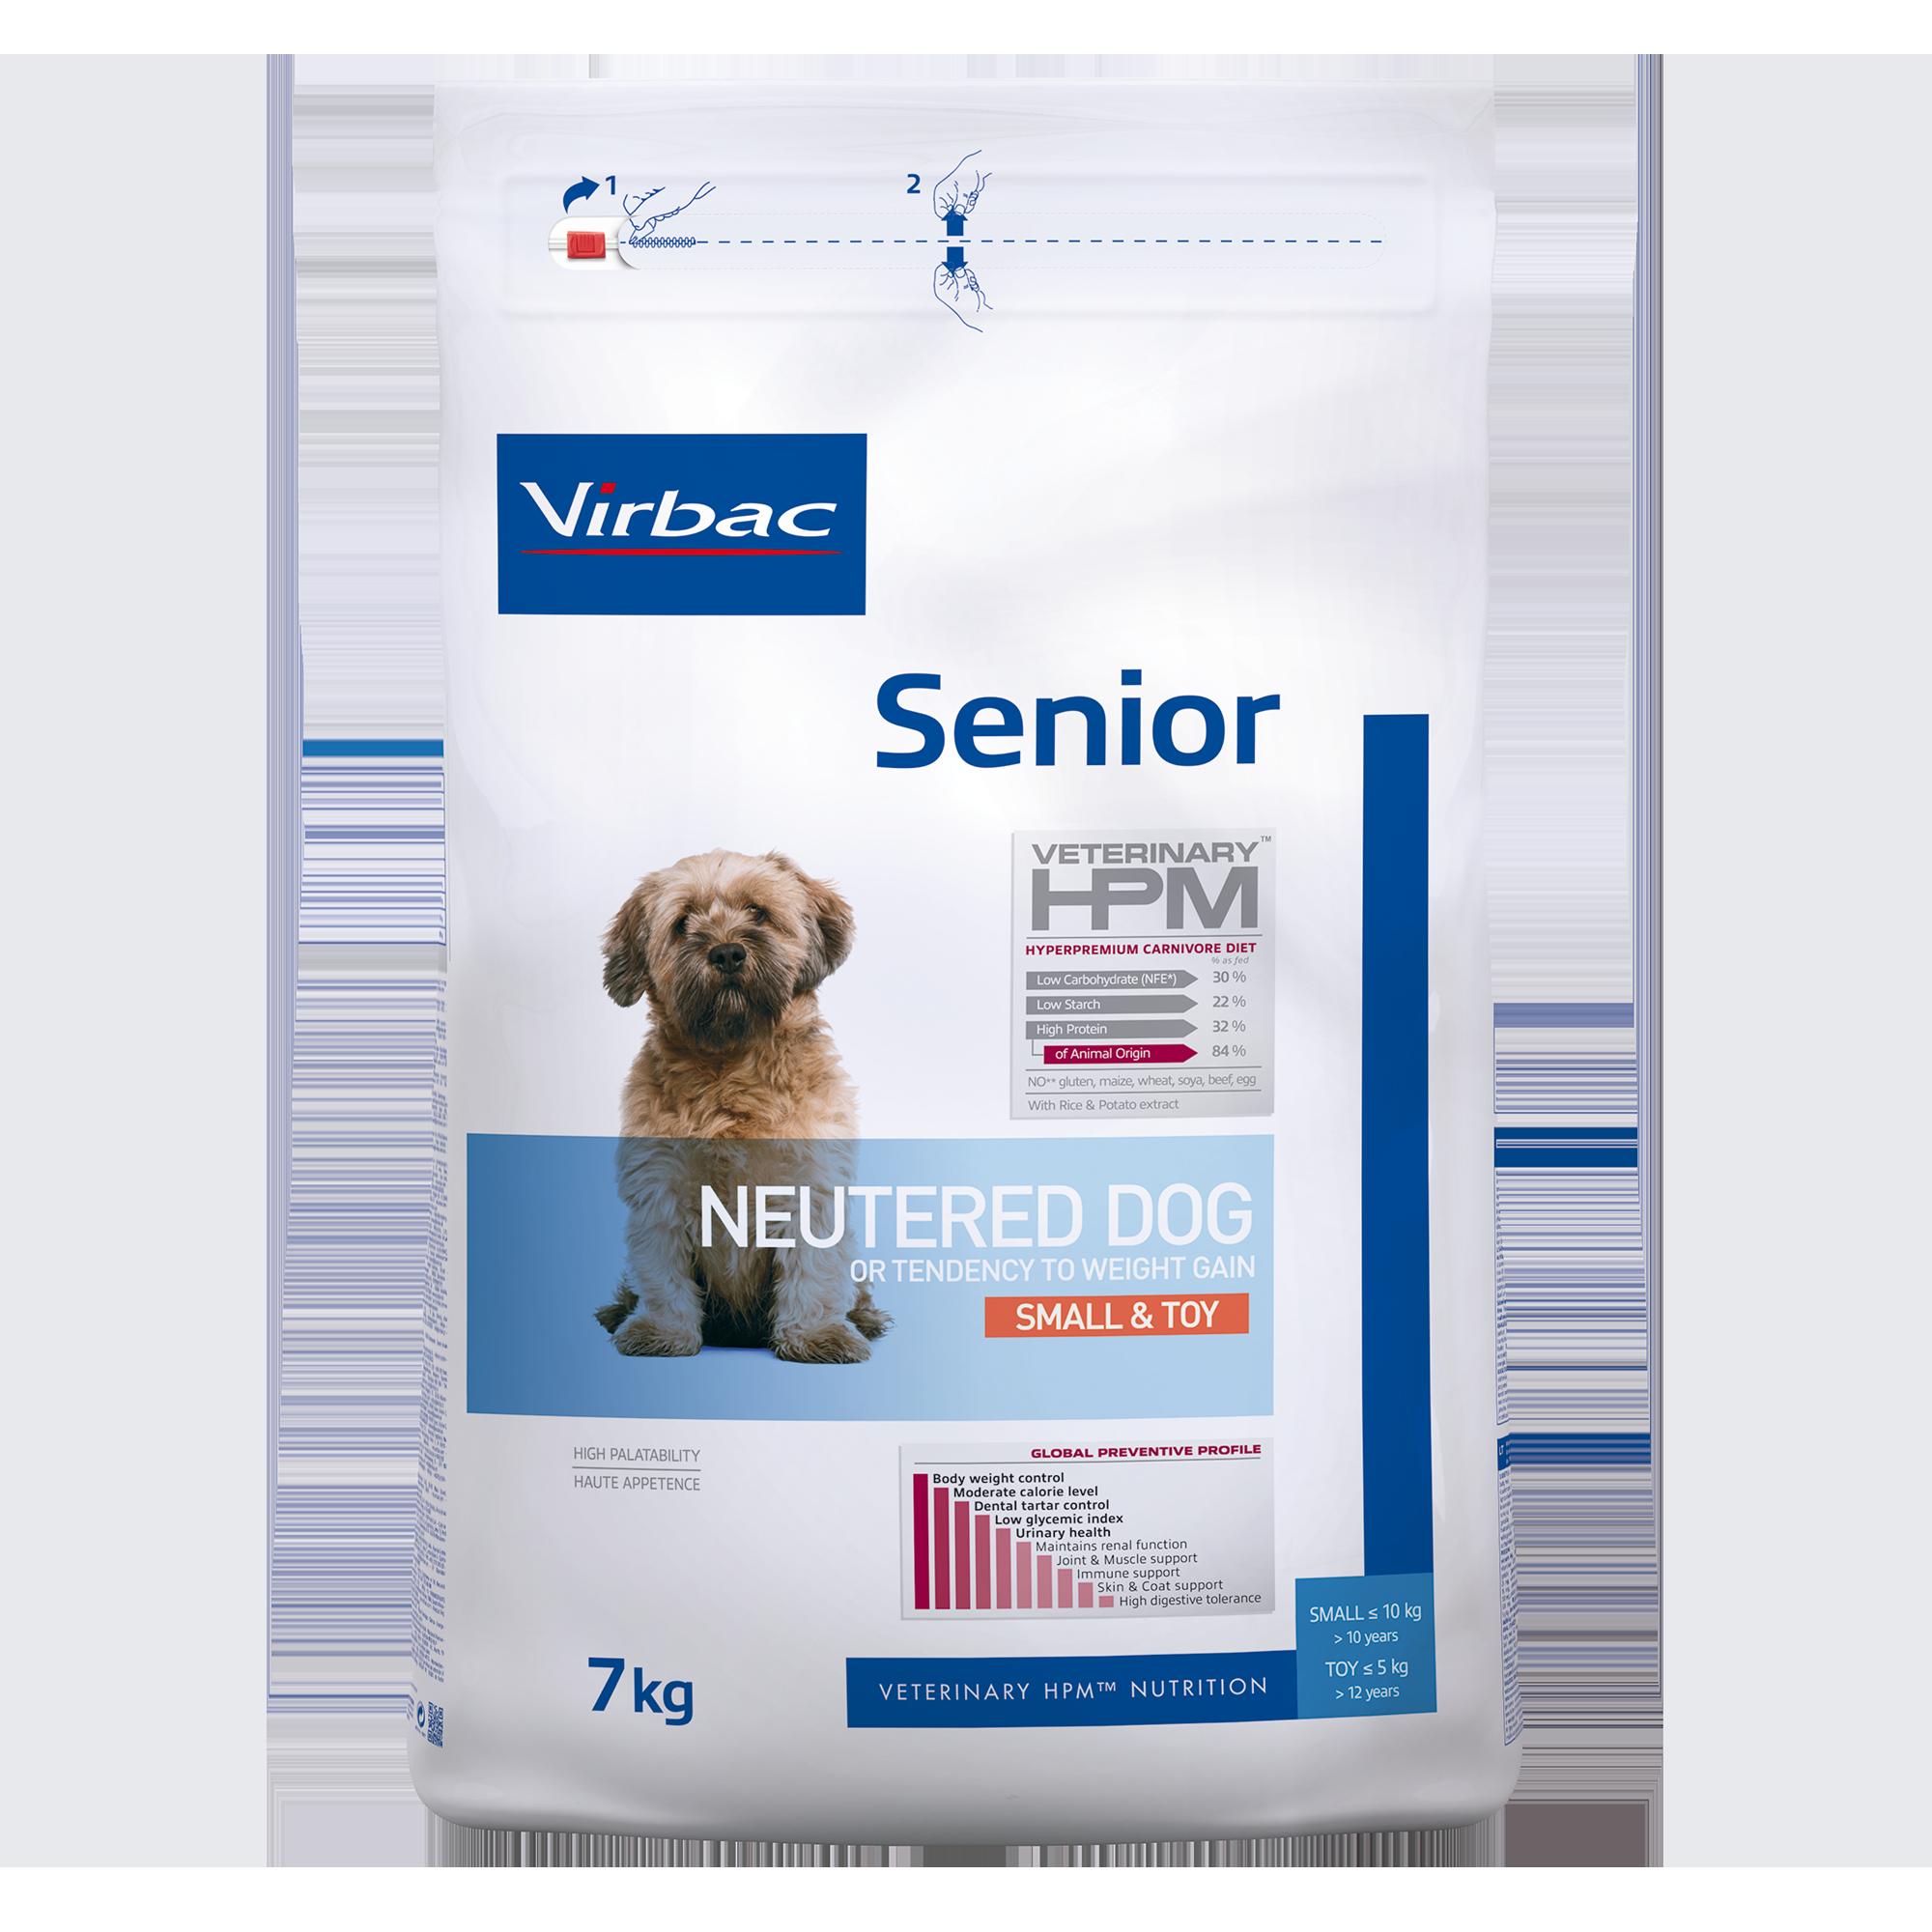 Senior Neutered Dog Small & Toy